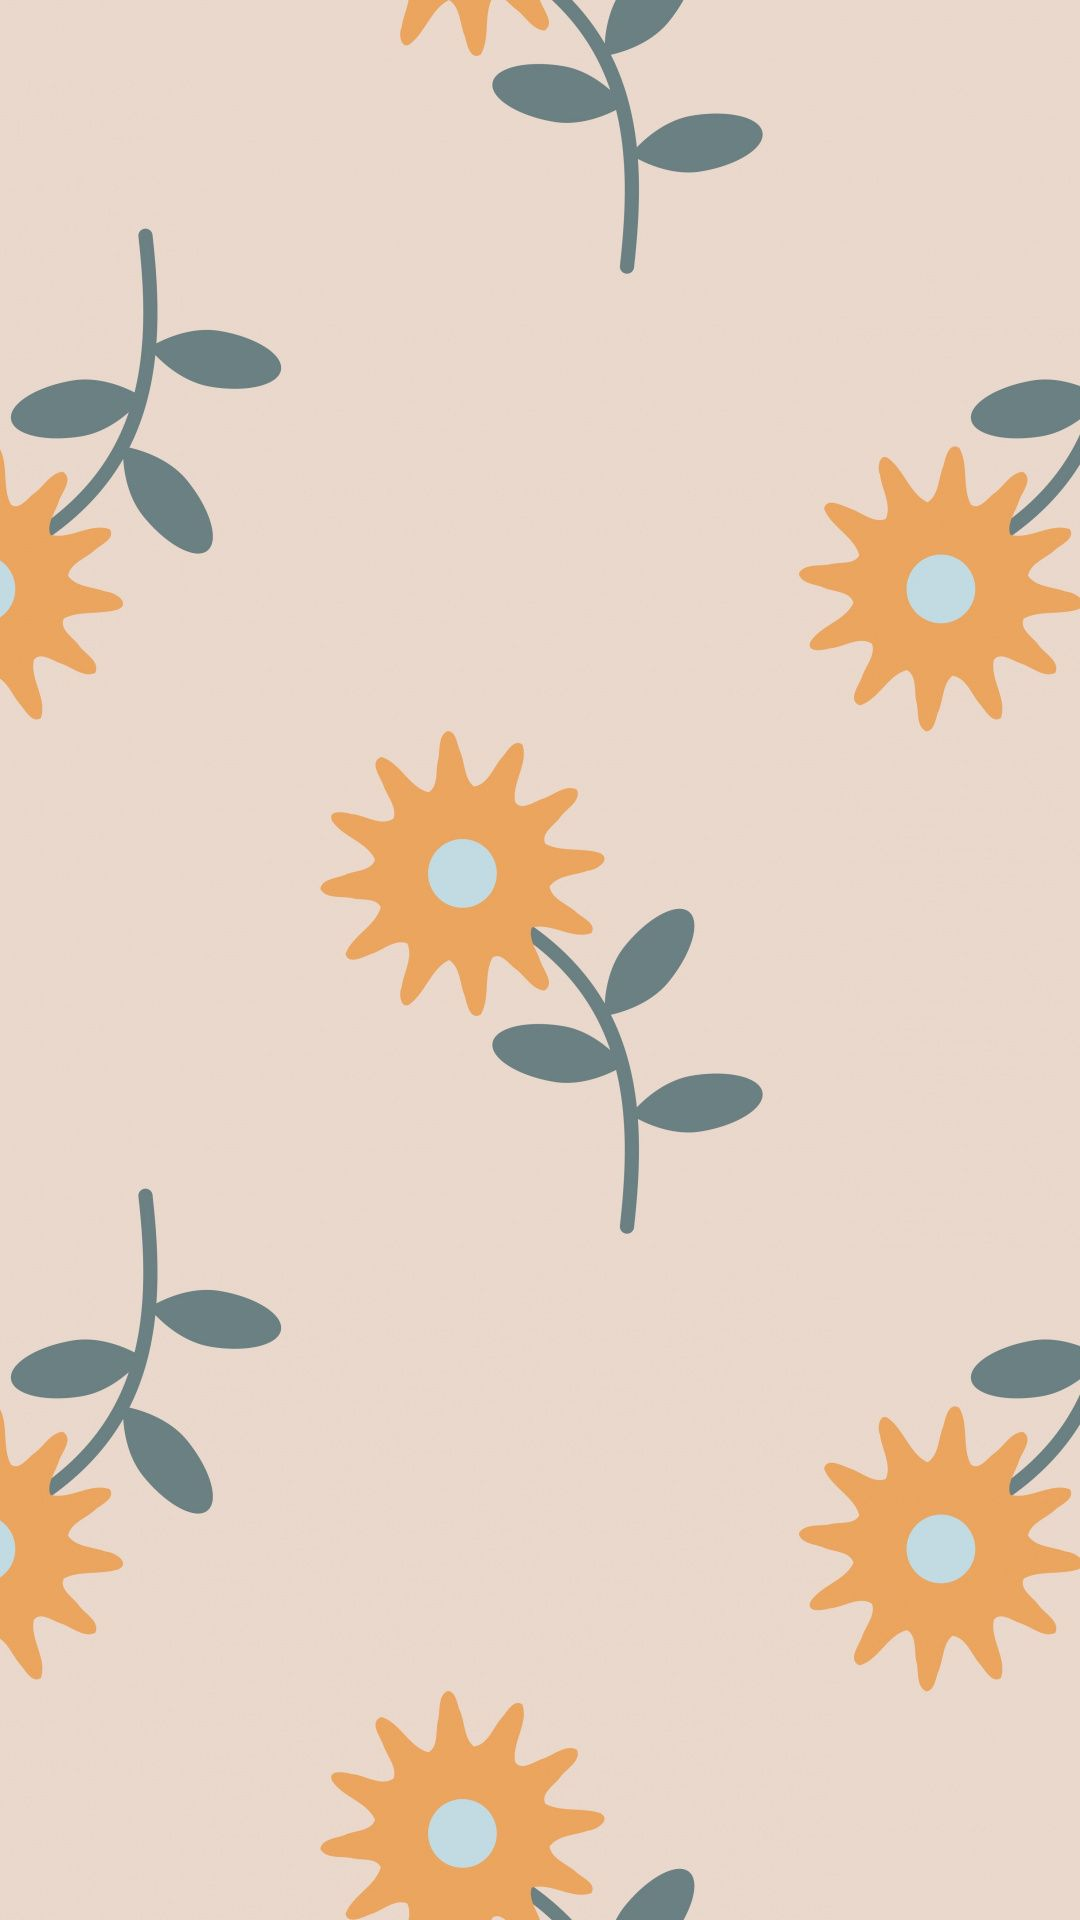 Texture Floral Pattern Abstract 1080x1920 Wallpaper Vintage Flowers Wallpaper Pretty Wallpaper Iphone Cute Patterns Wallpaper